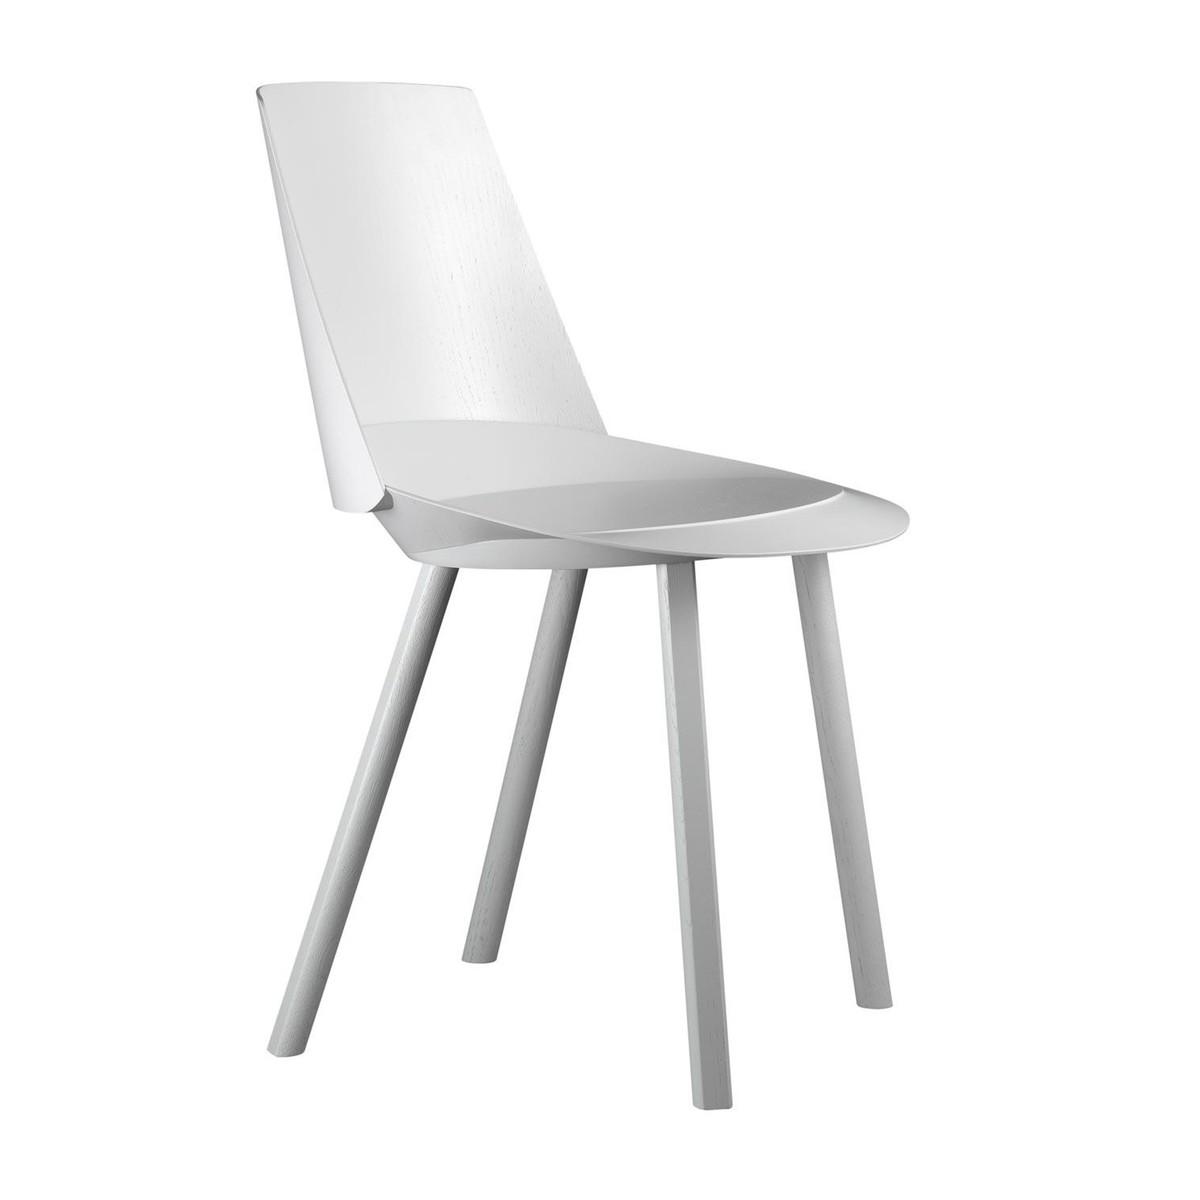 e15 houdini stuhl ch04 e15. Black Bedroom Furniture Sets. Home Design Ideas